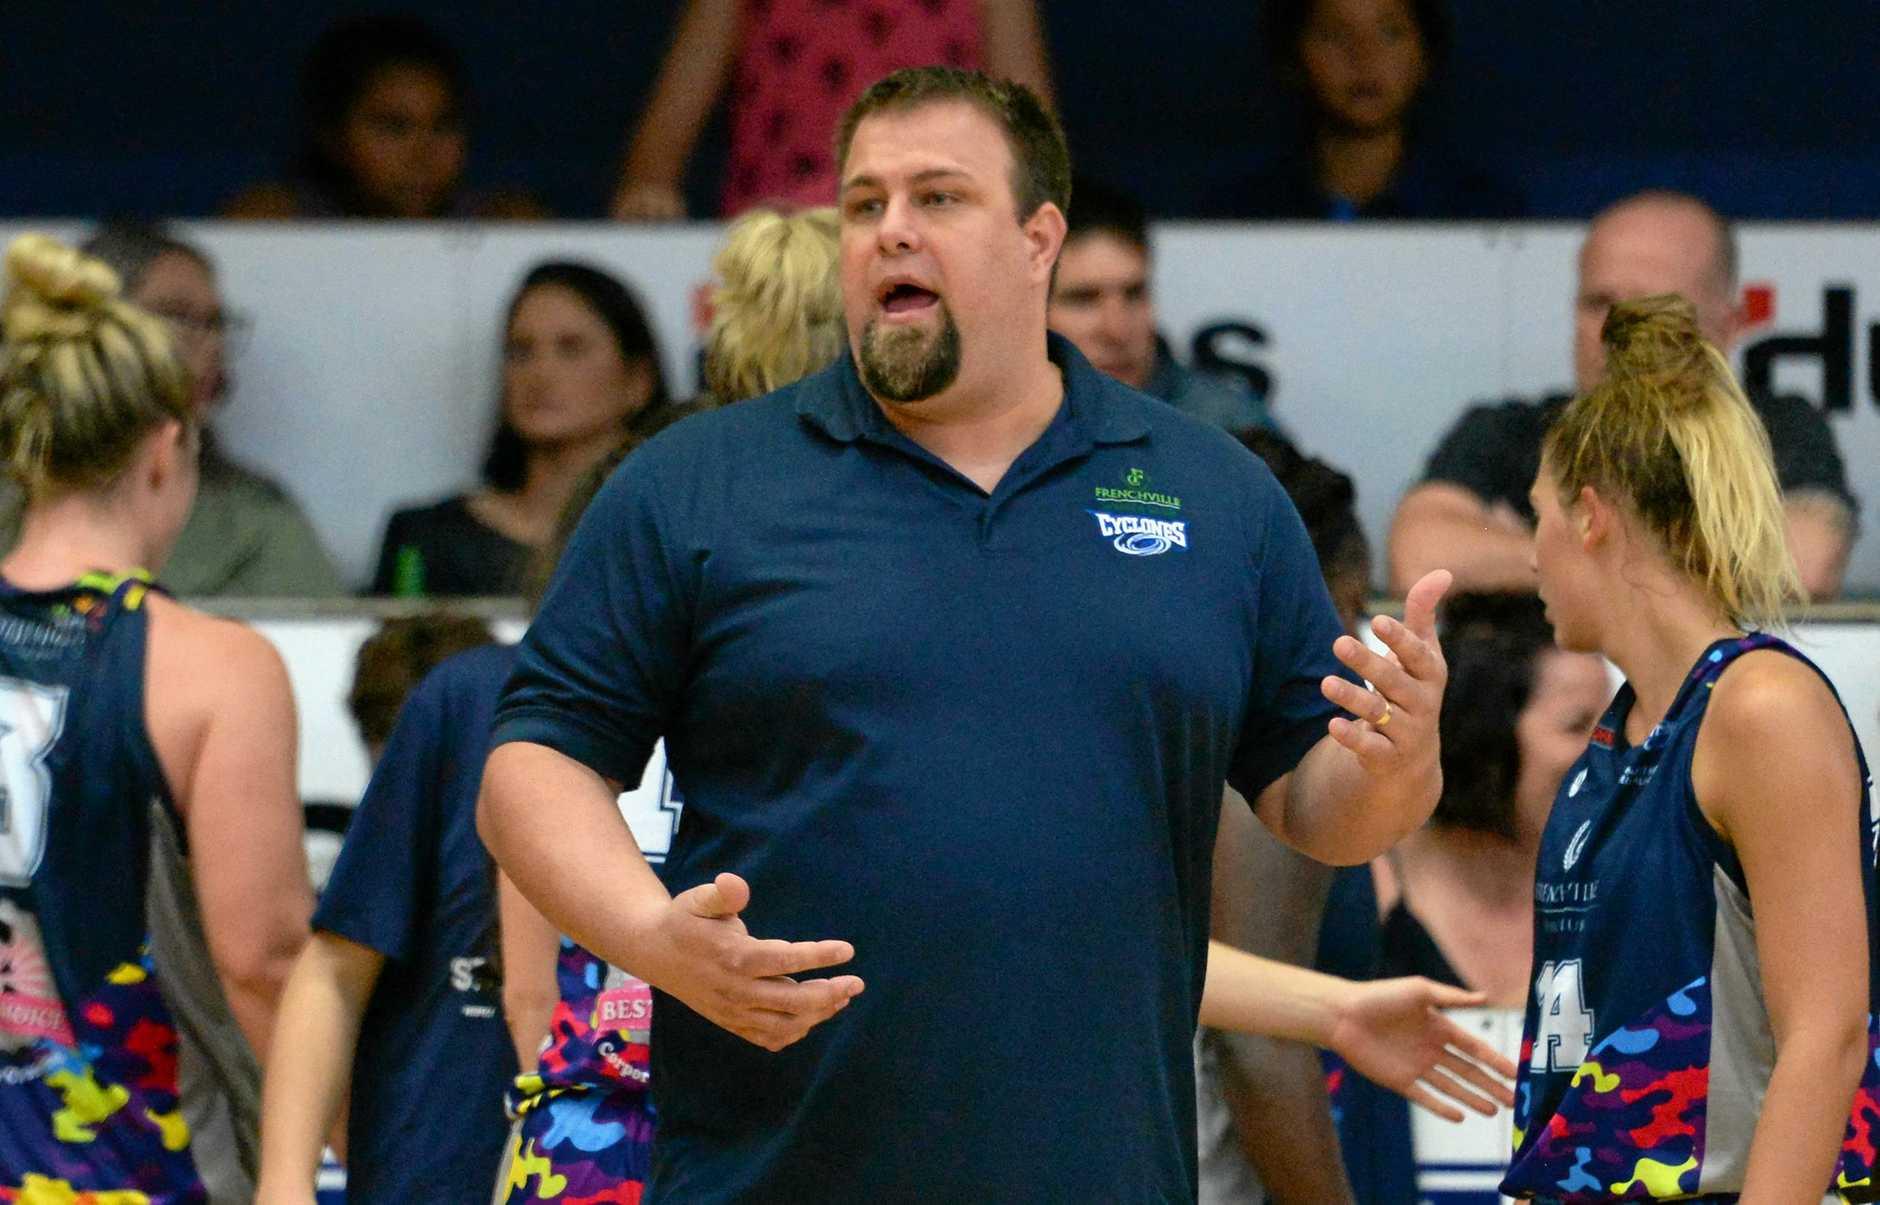 Cyclones coach Chris Muggeridge: